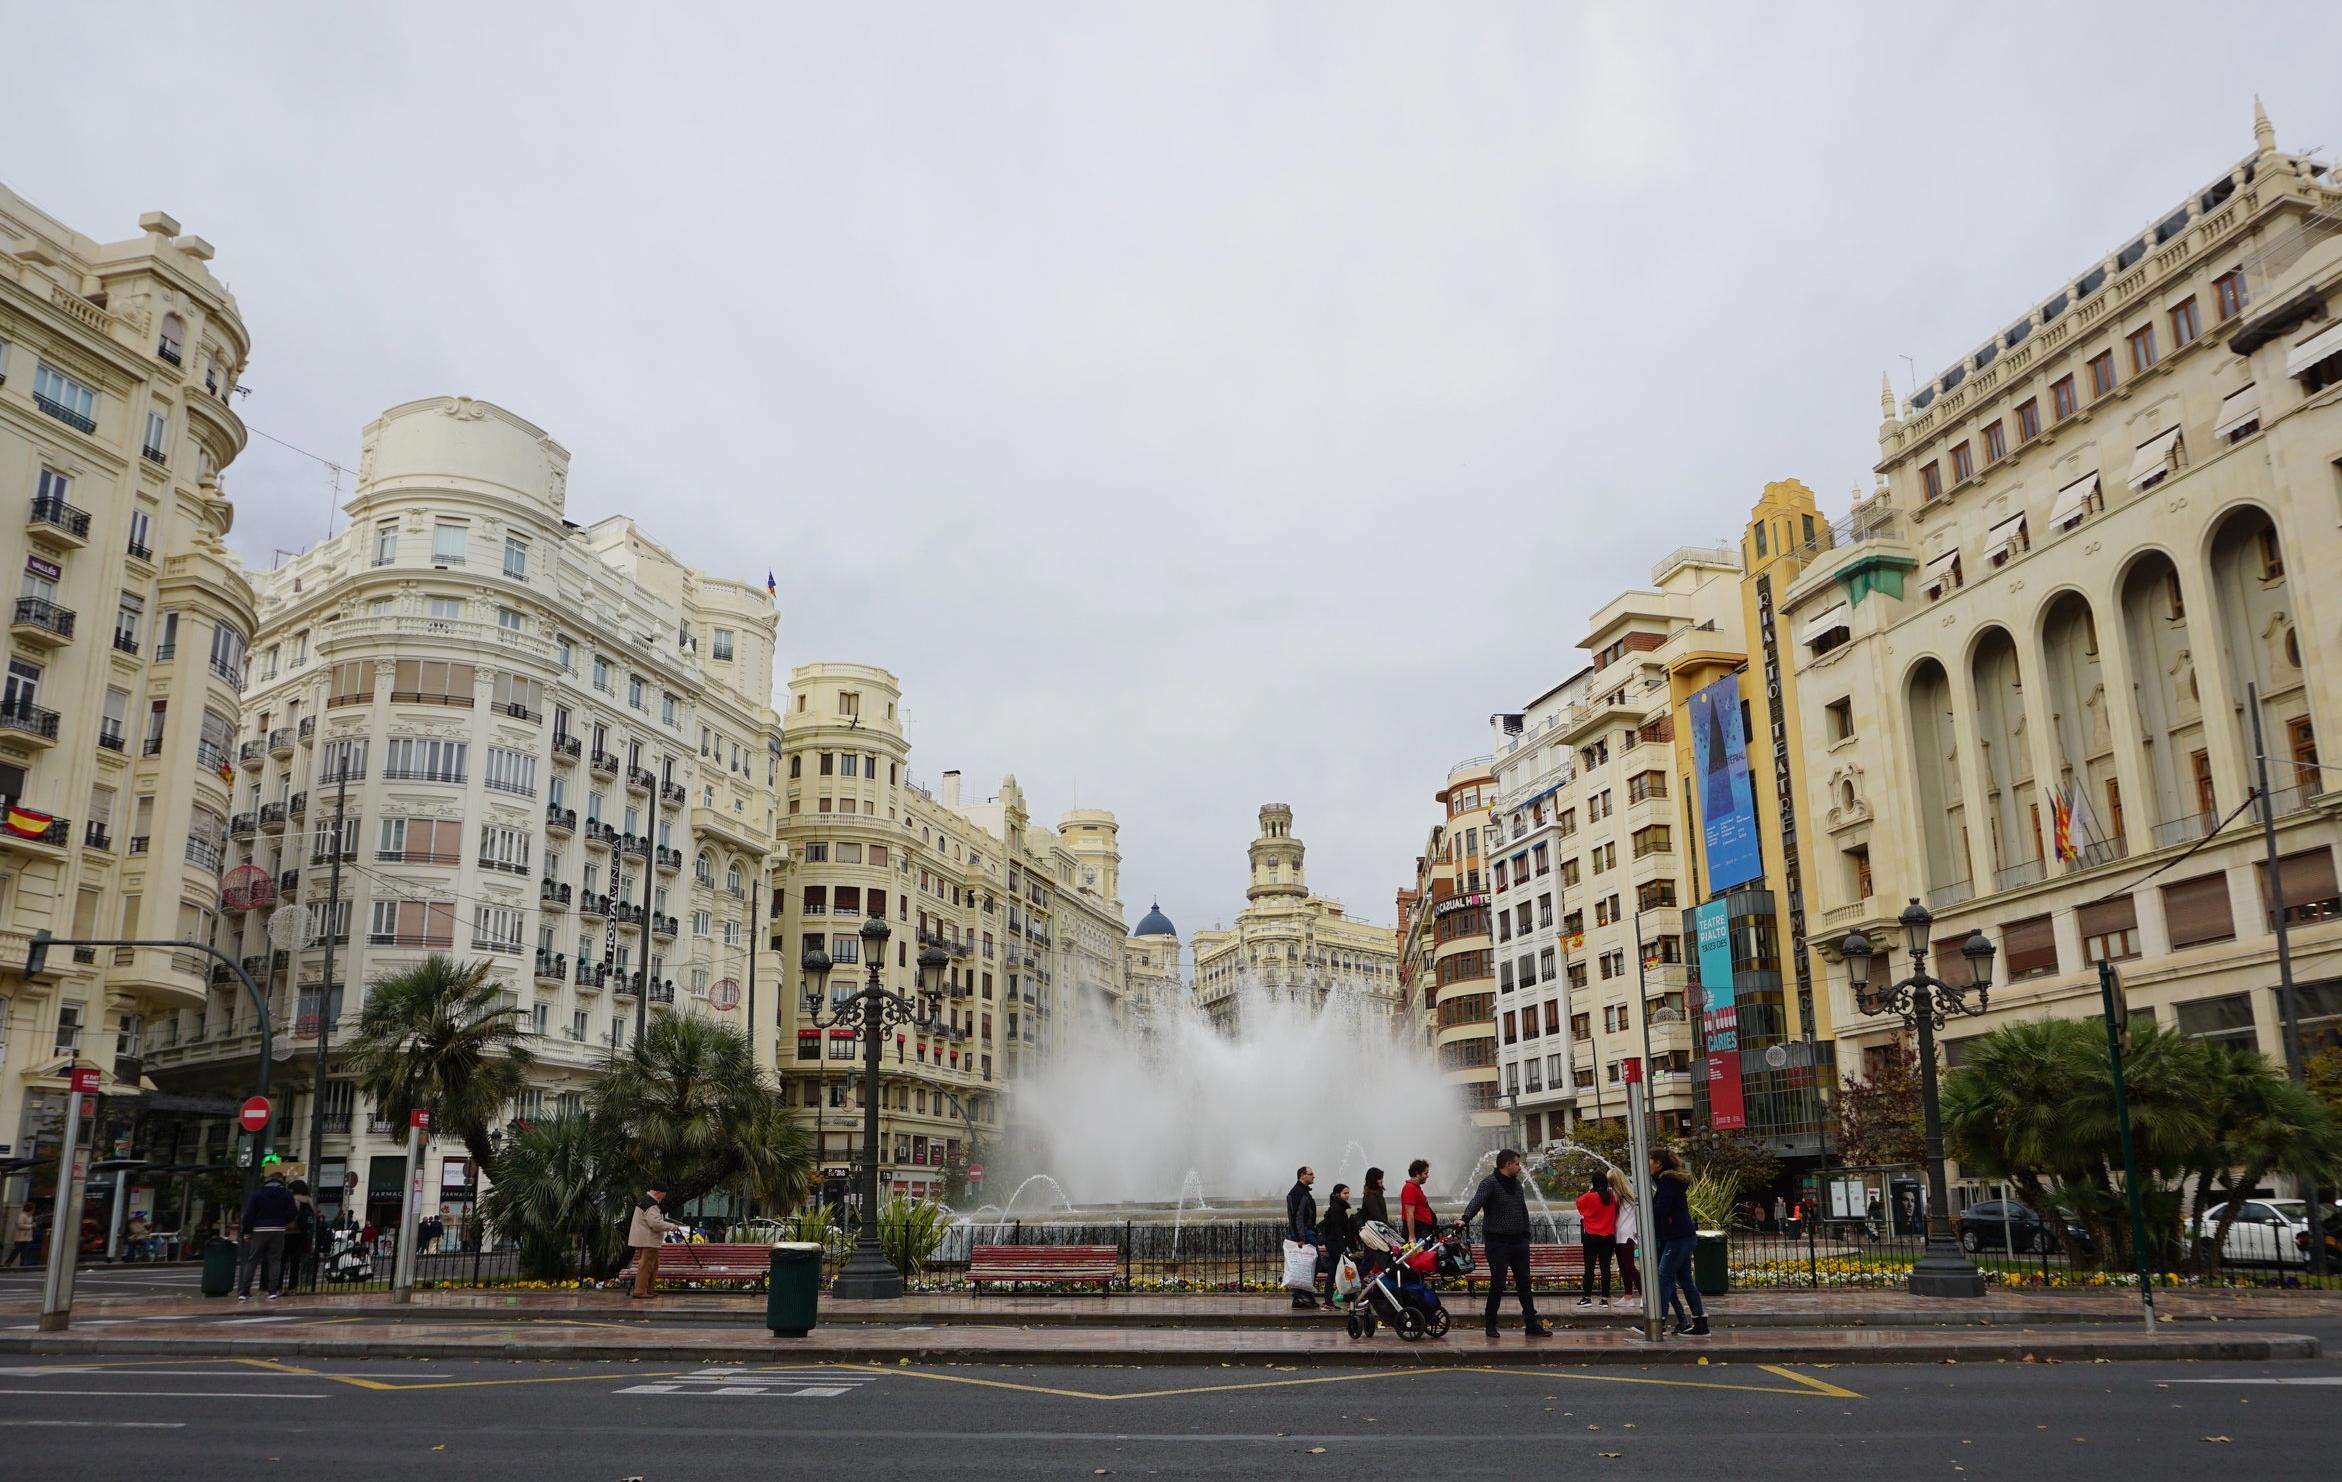 Plaza Ayuntamiento, Valencia Spain